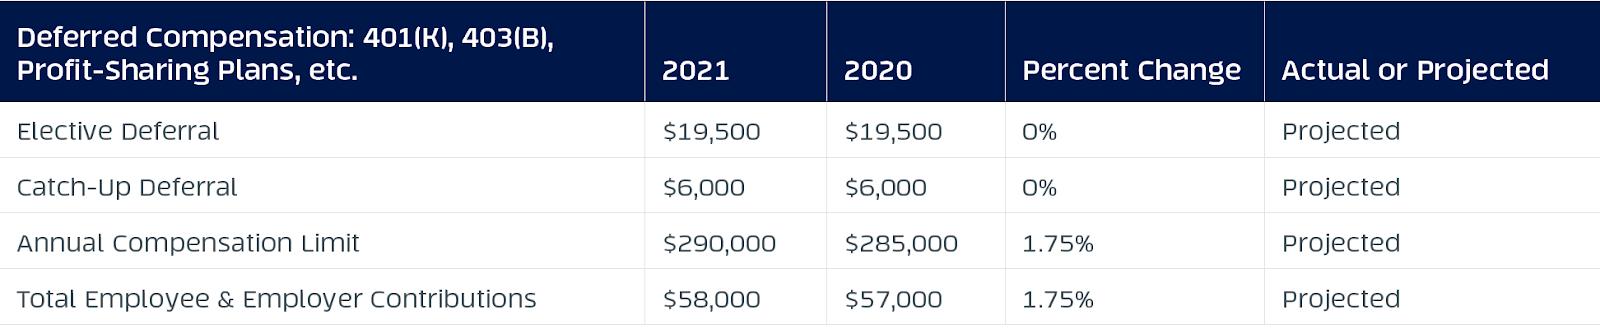 2021 vs. 2020 annual compensation limits